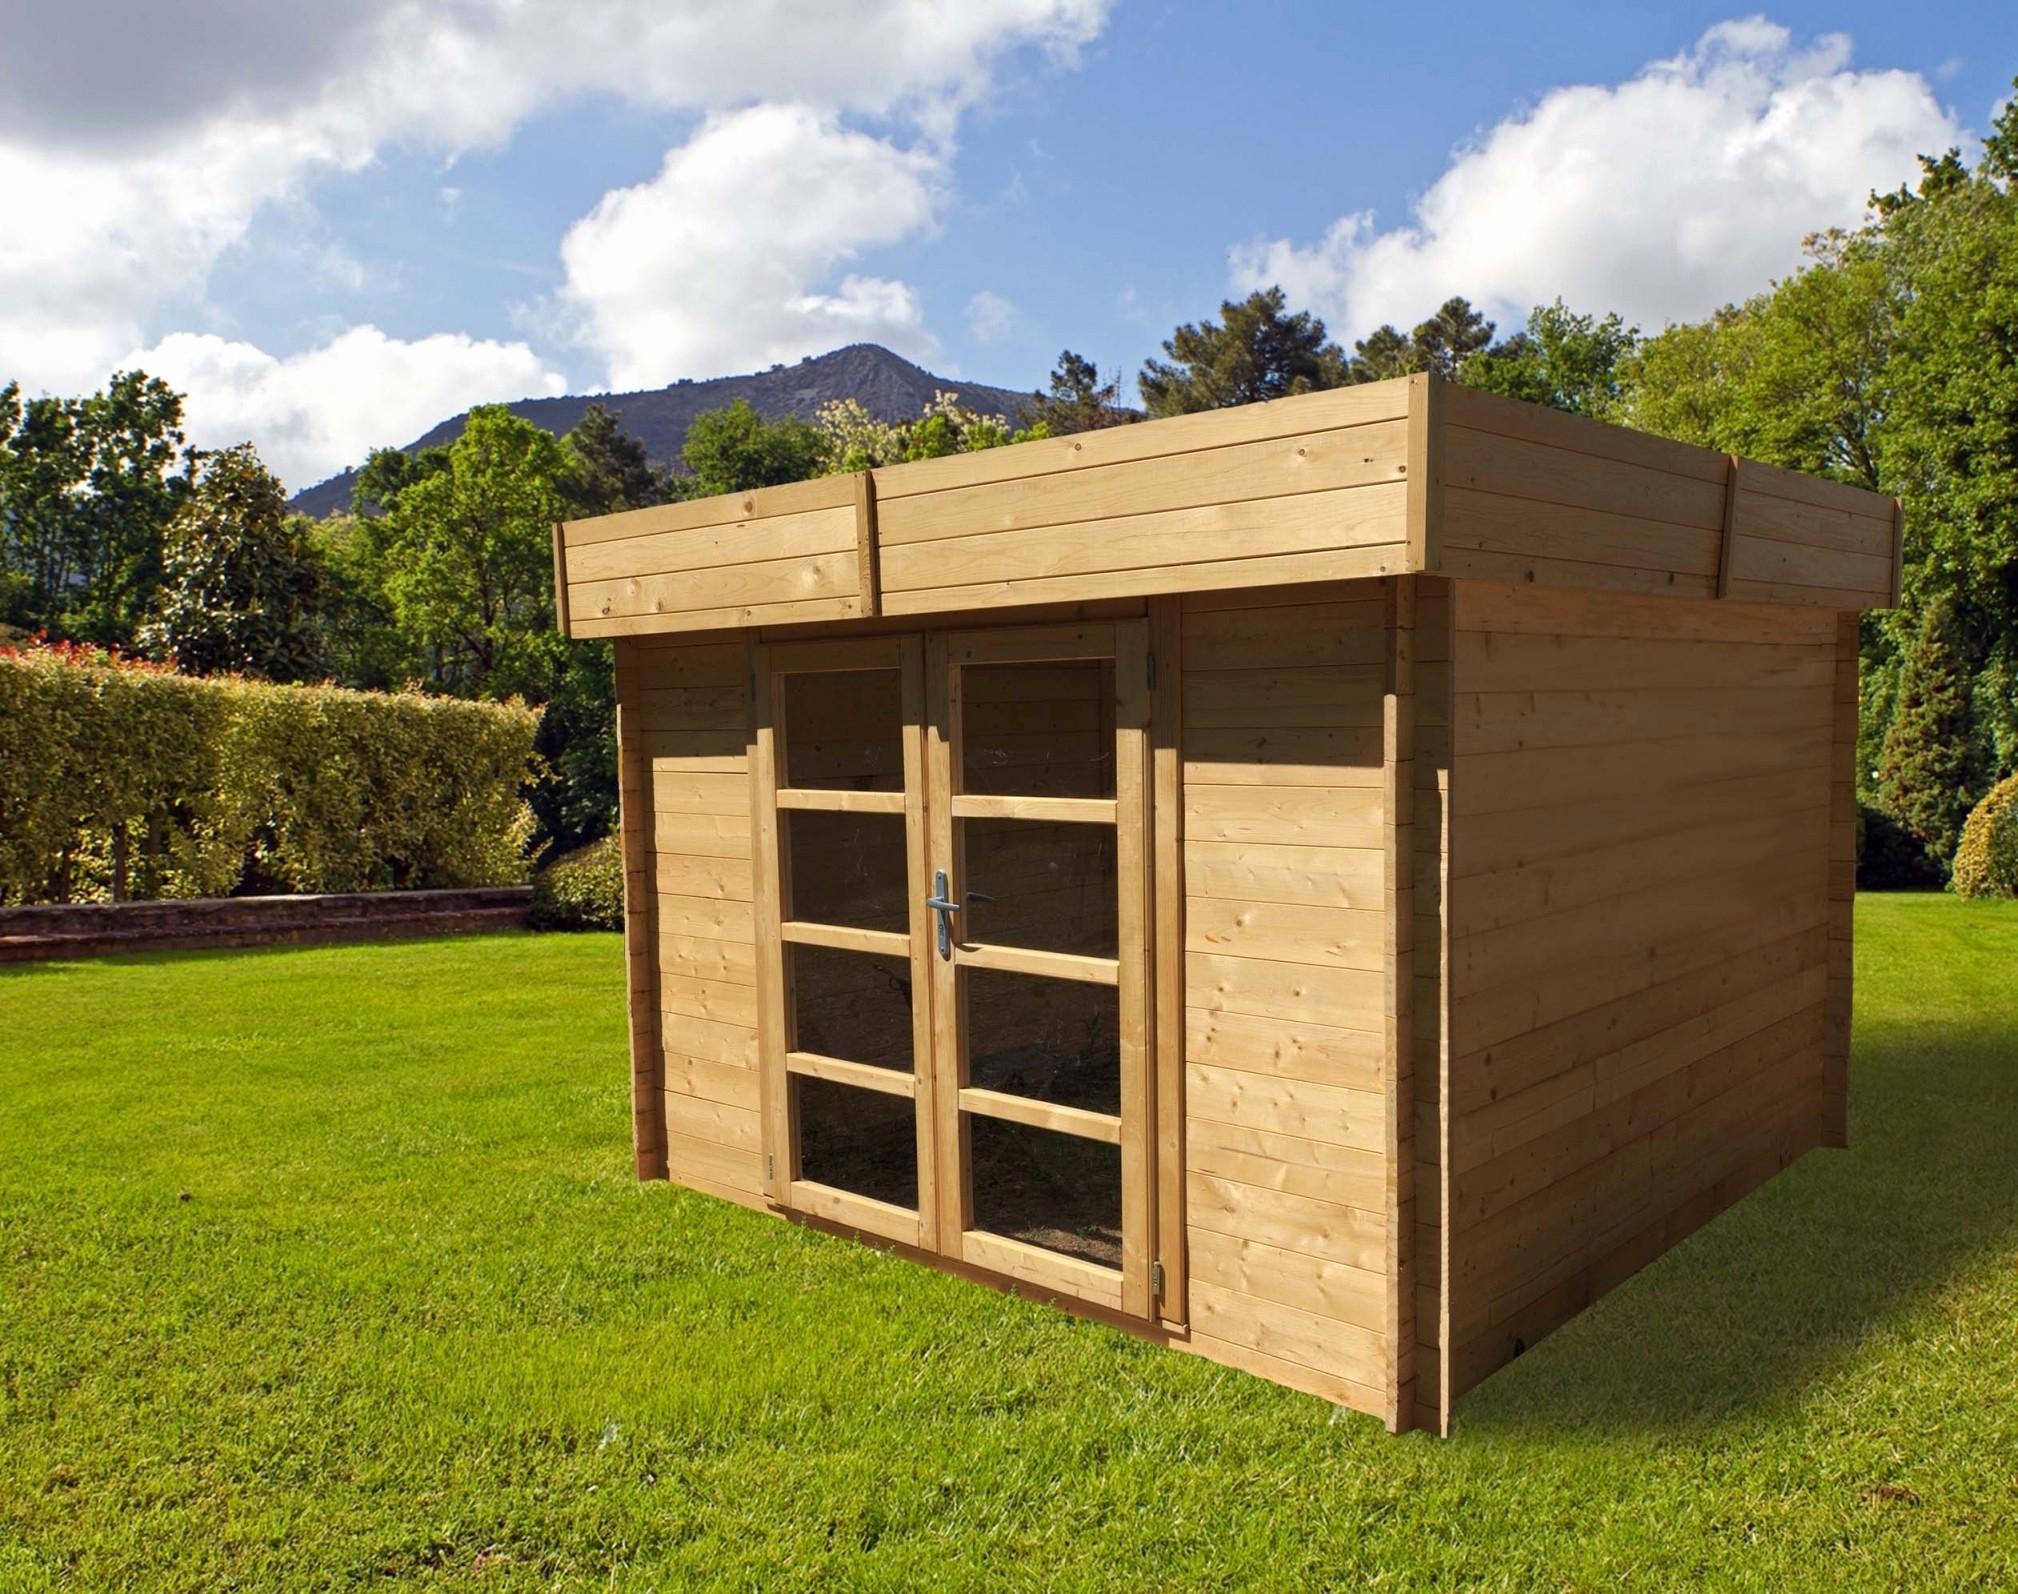 Chalet Leroy Merlin Impressionnant Galerie Chalet Jardin Leroy Merlin Plus Simple Jardin Bois Awesome 82 Besten